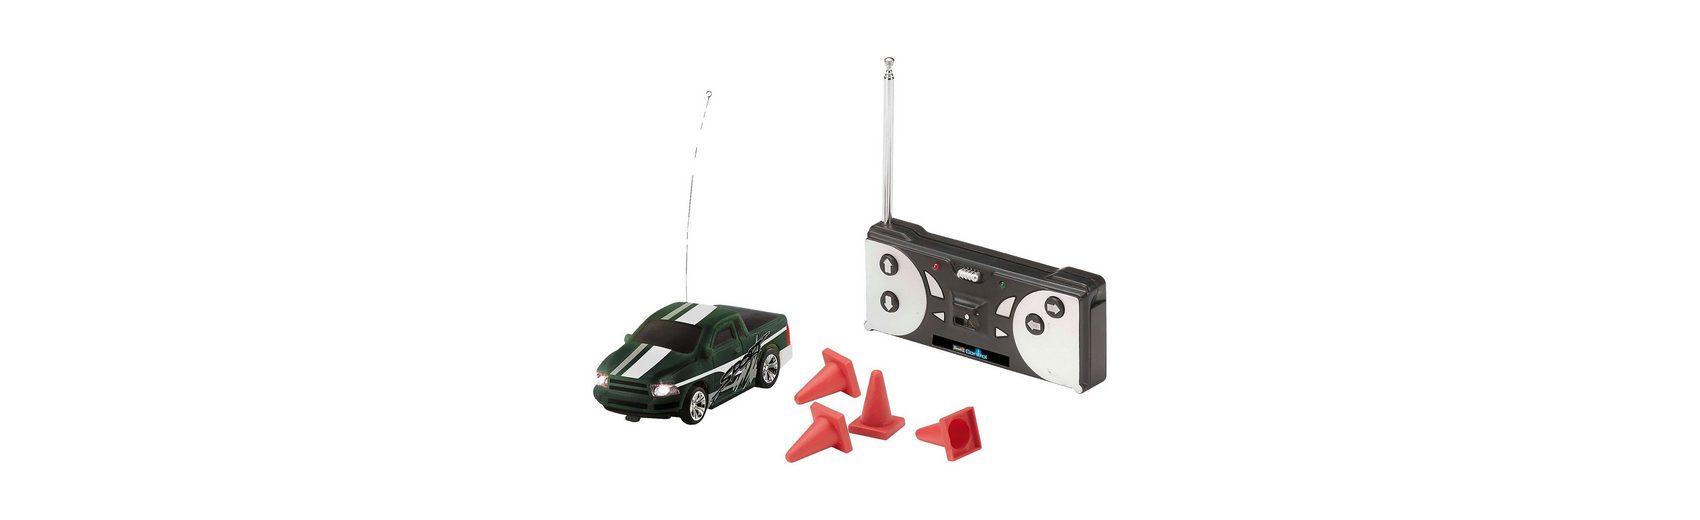 Revell Control - Mini RC Car - Pick Up